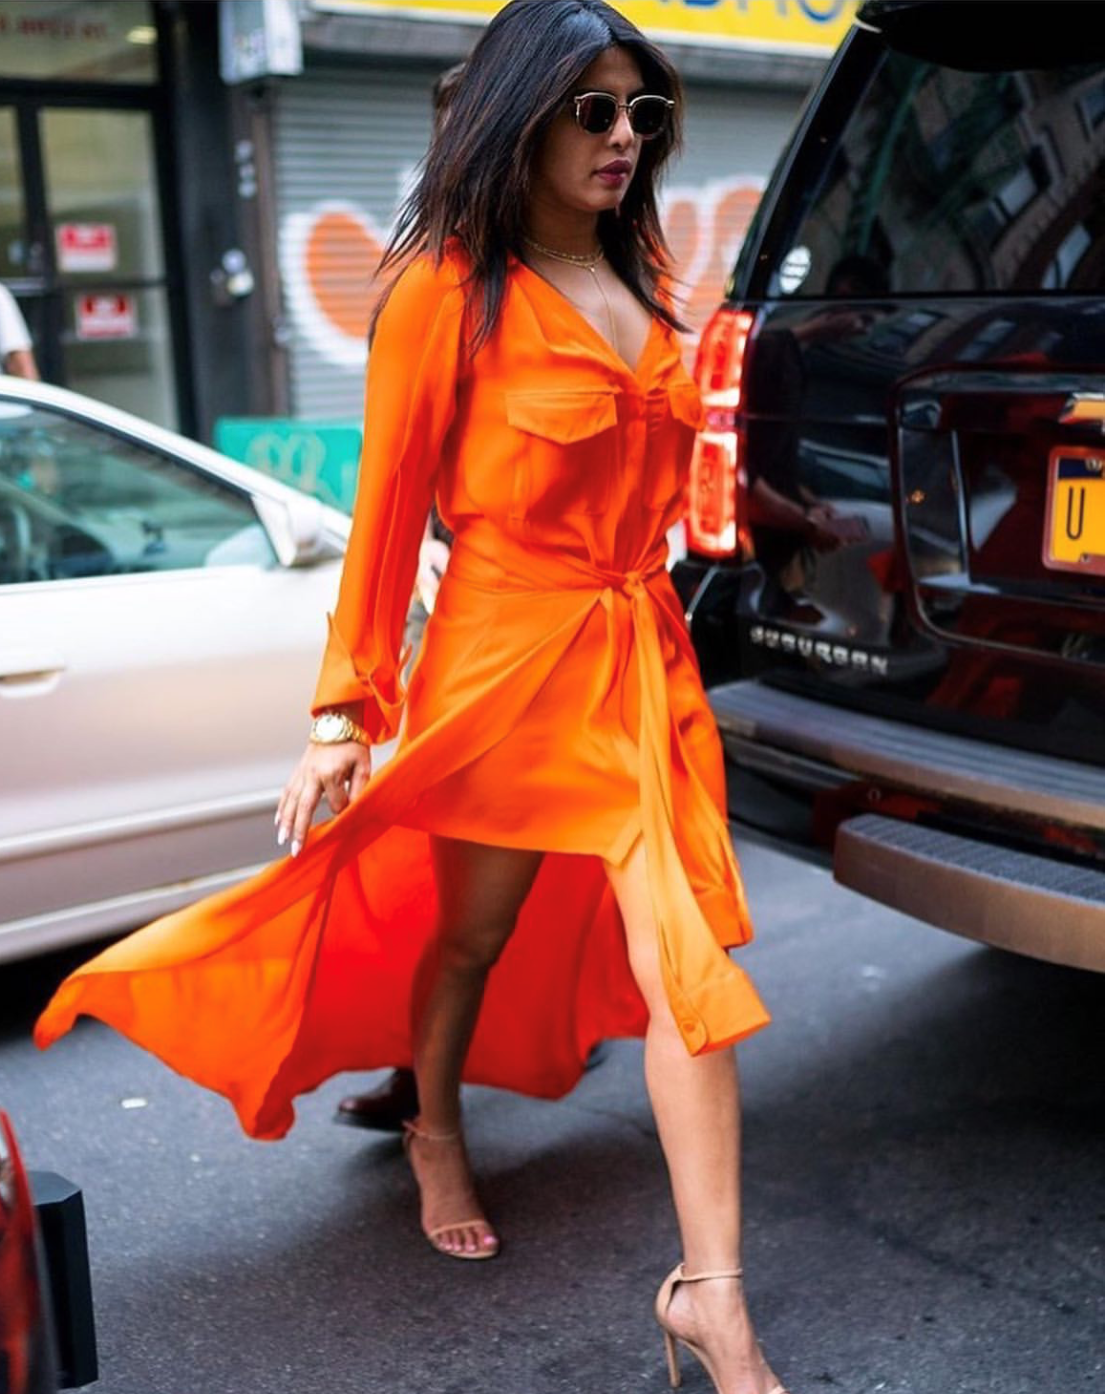 Priyanka Chopra wearing the Pre-Fall 2019 Overture Flame Shirtdress in New York City